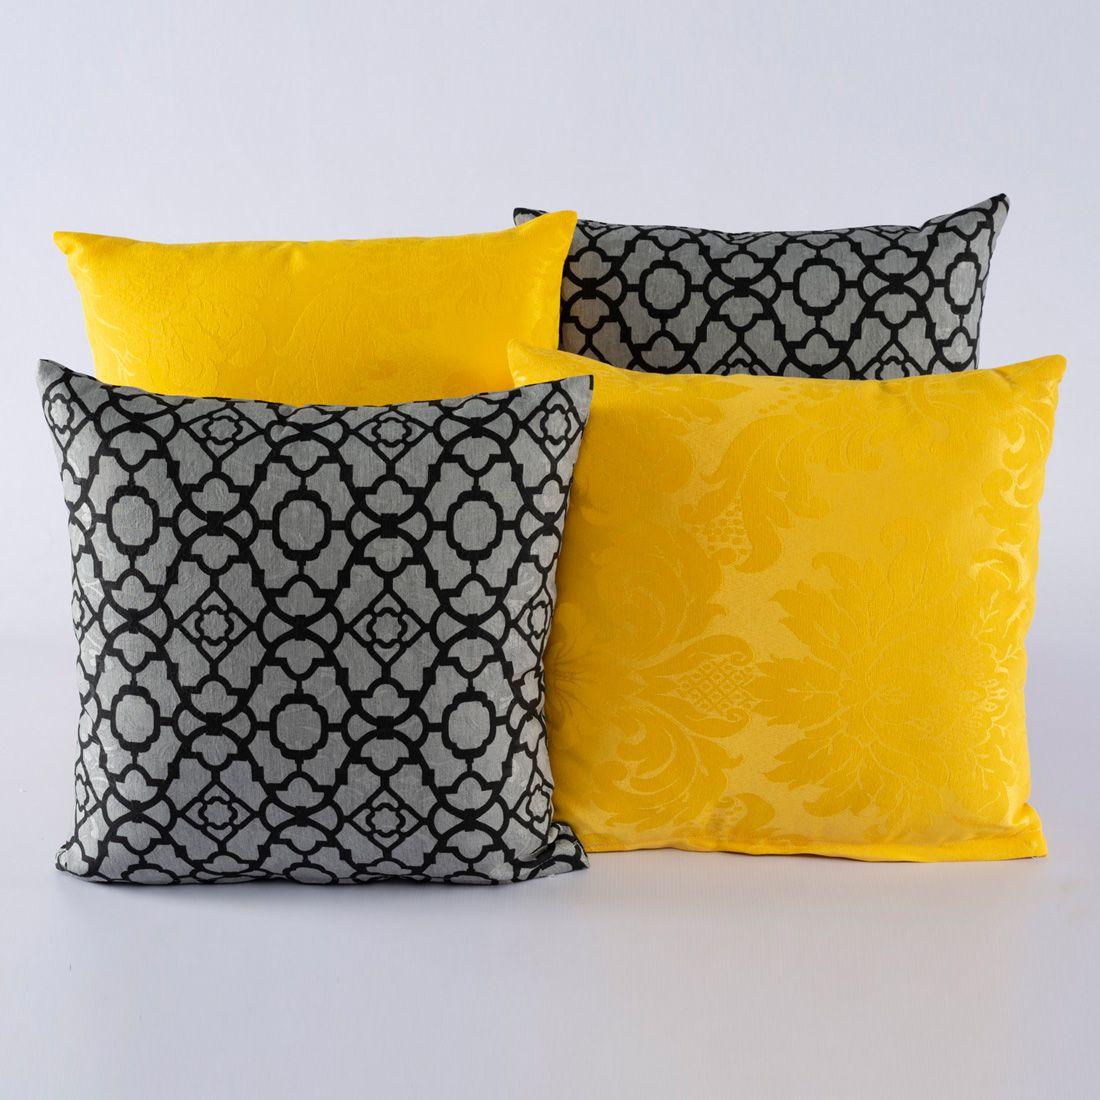 Kit c/ 4 Almofadas Cheias Decorativas Geométrico Cinza/Amarelo